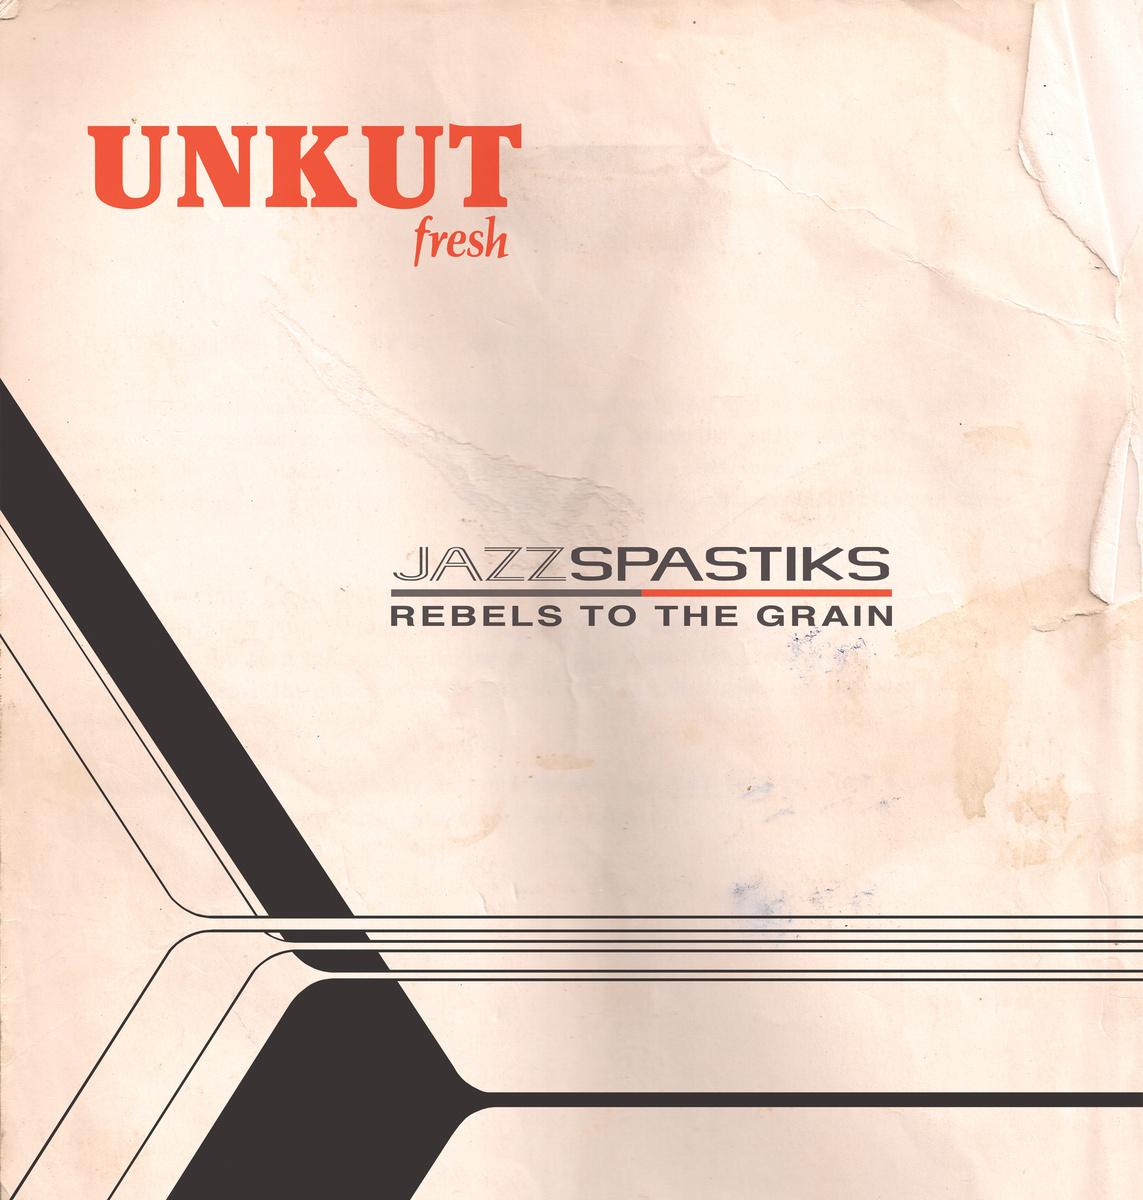 Jazz_spastiks___rebels_to_the_grain_presentan_unkut_fresh